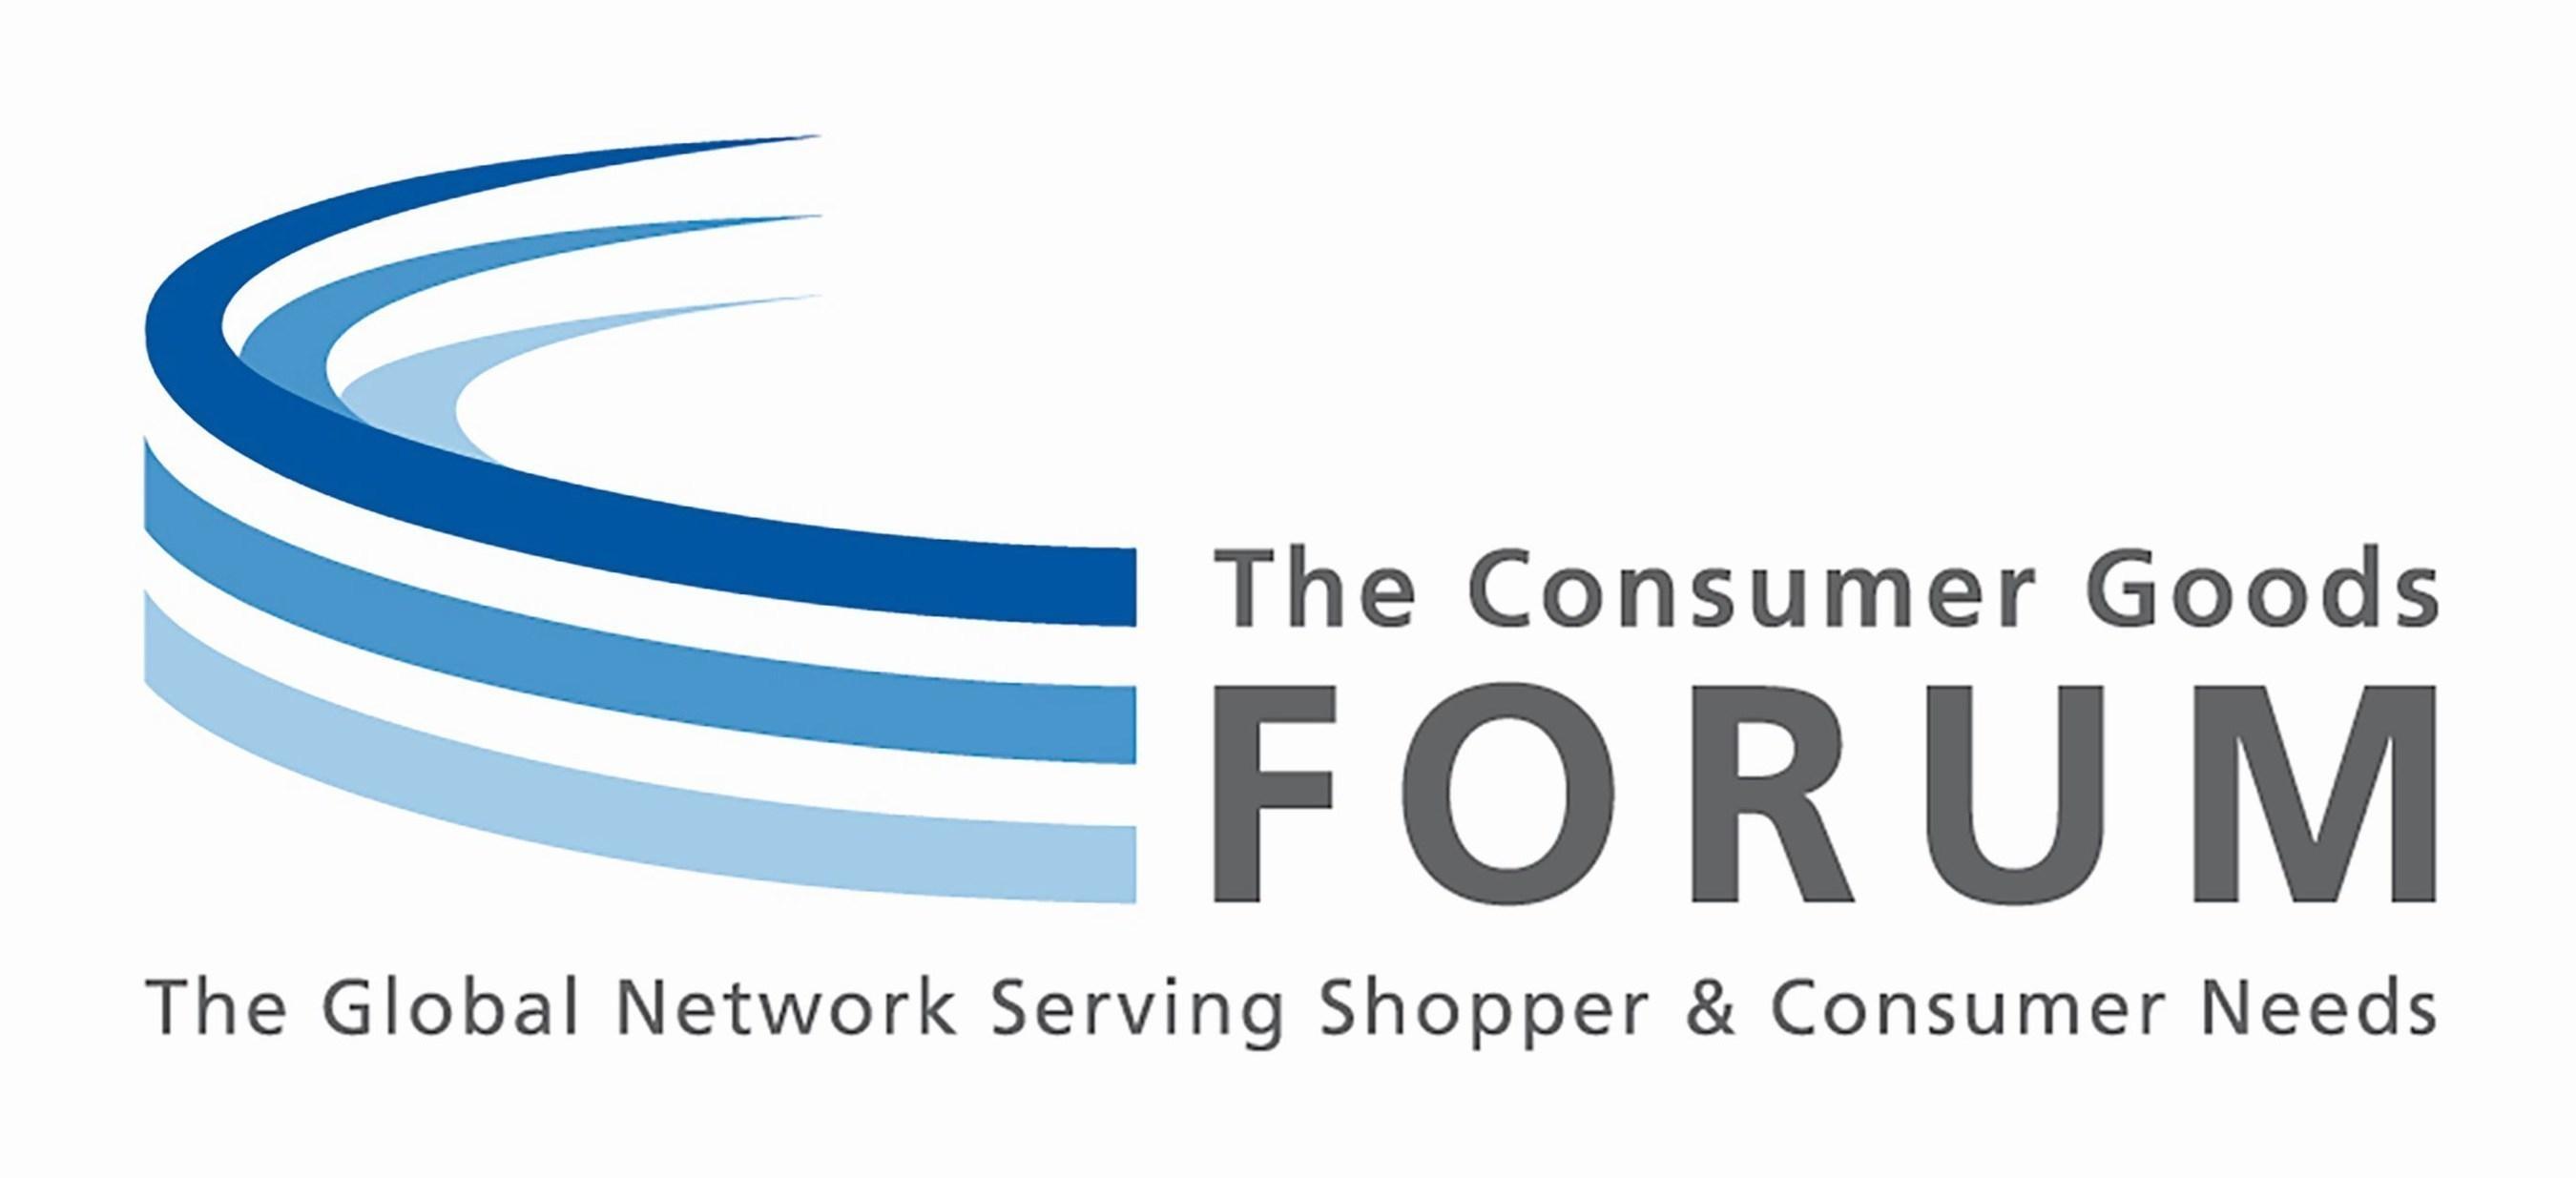 The Consumer Goods Forum (PRNewsFoto/The Consumer Goods Forum) (PRNewsFoto/The Consumer Goods Forum)